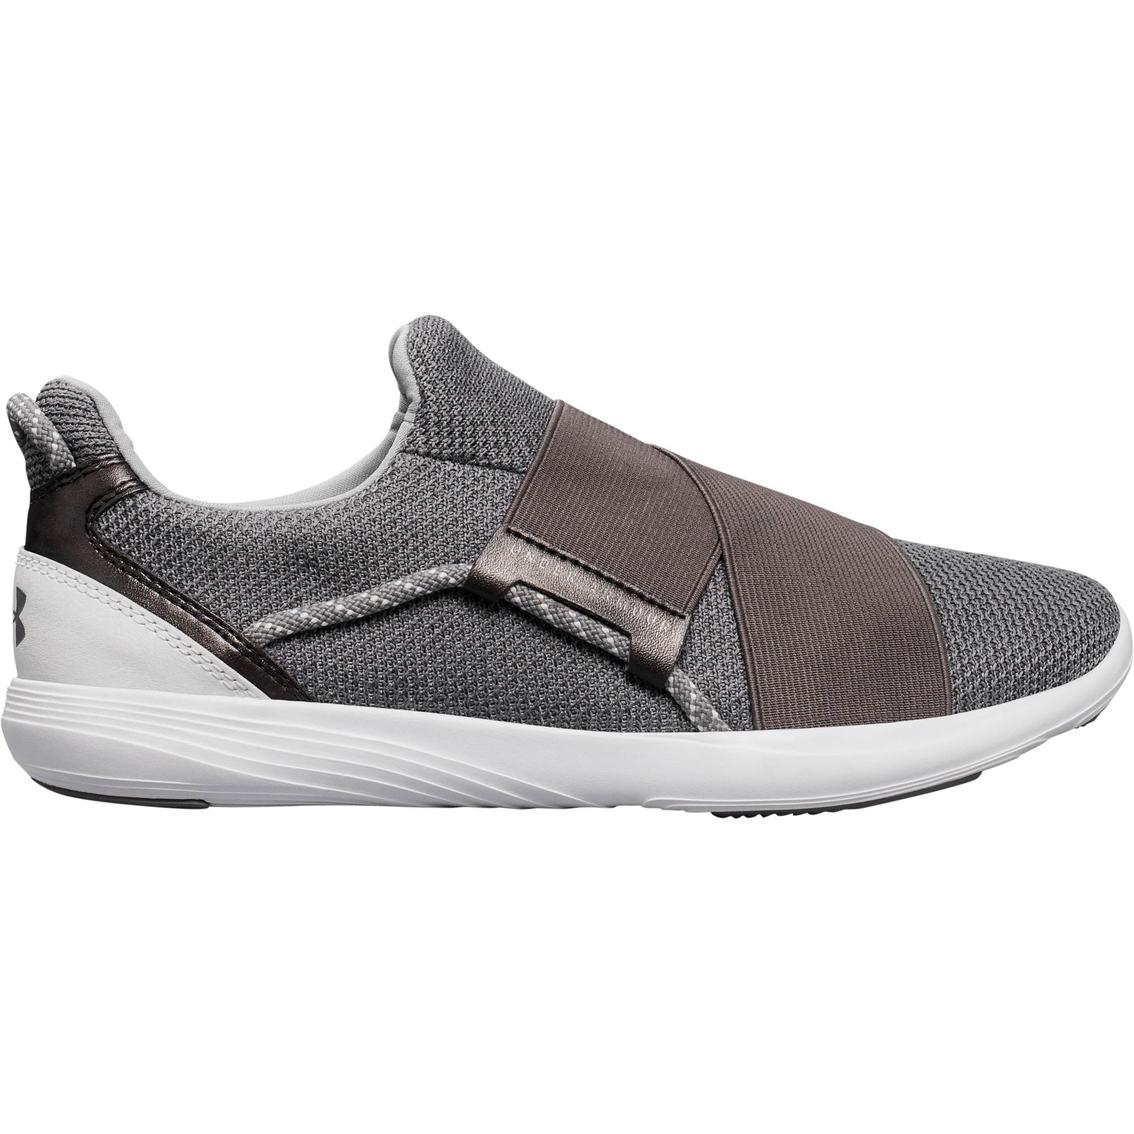 Under Armour Women s Precision X Shoes  4a5e9c751b